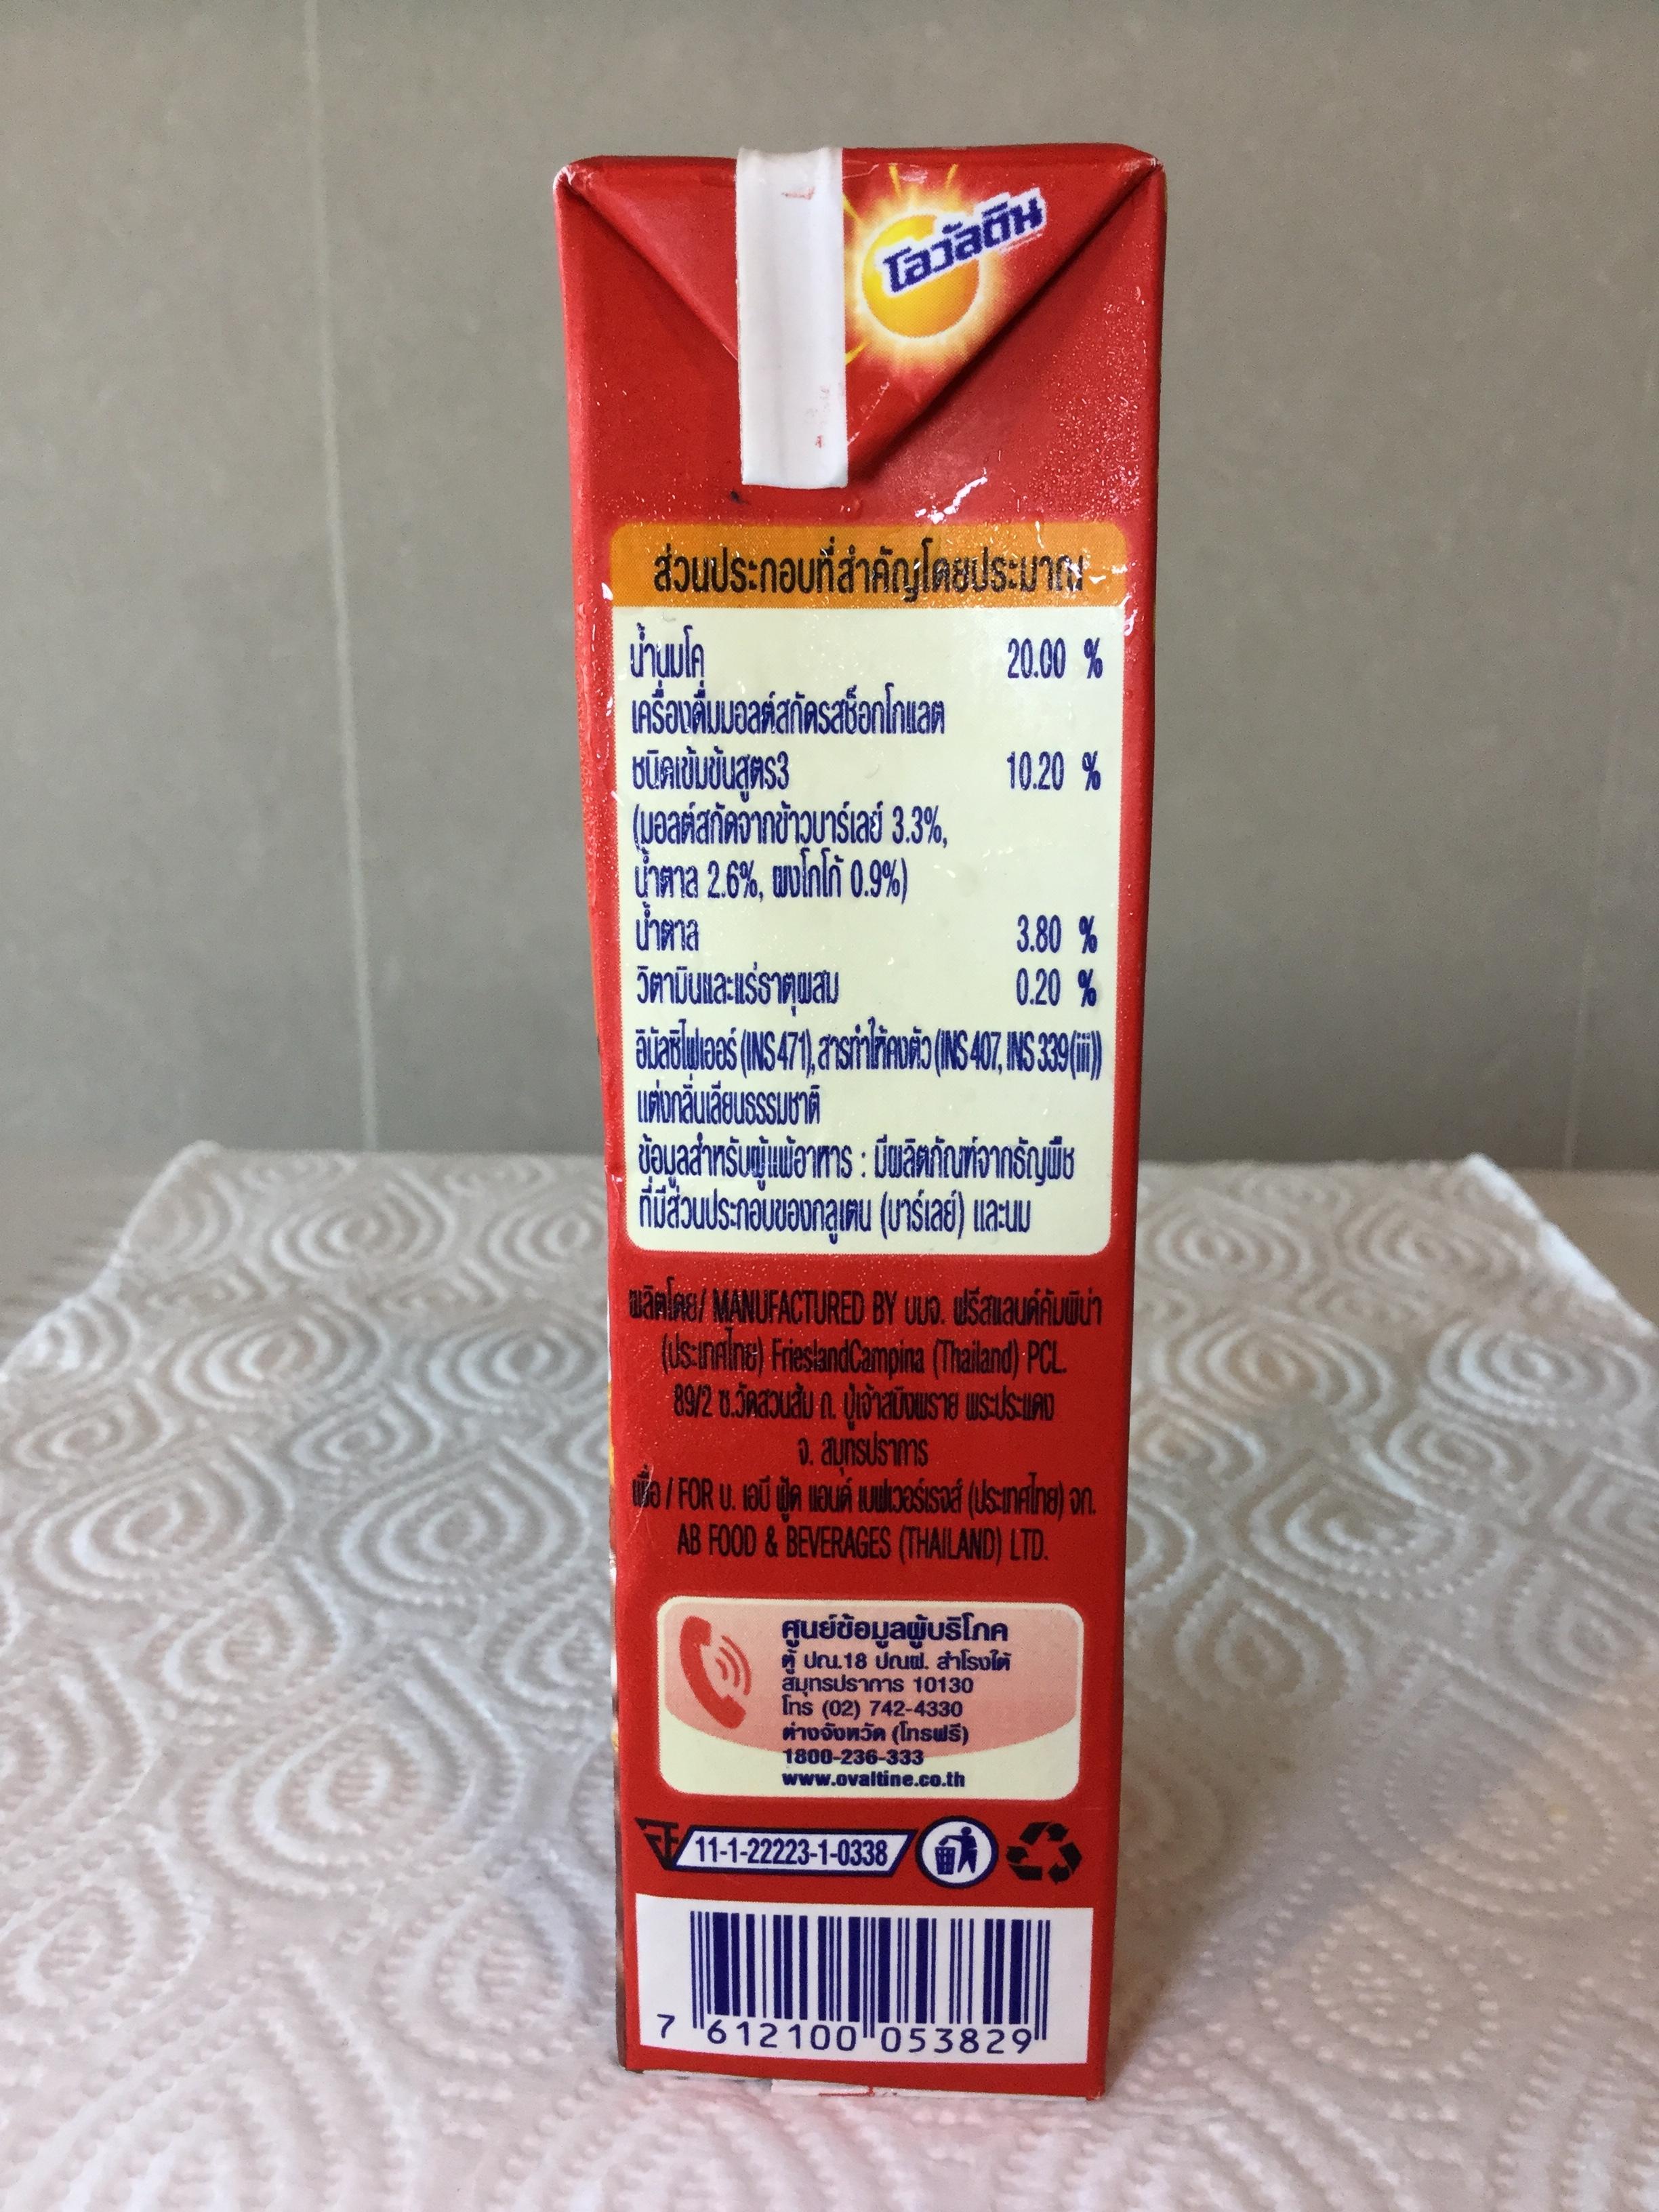 Ovaltine Milk UHT Thailand  Chocolate Milk Reviews